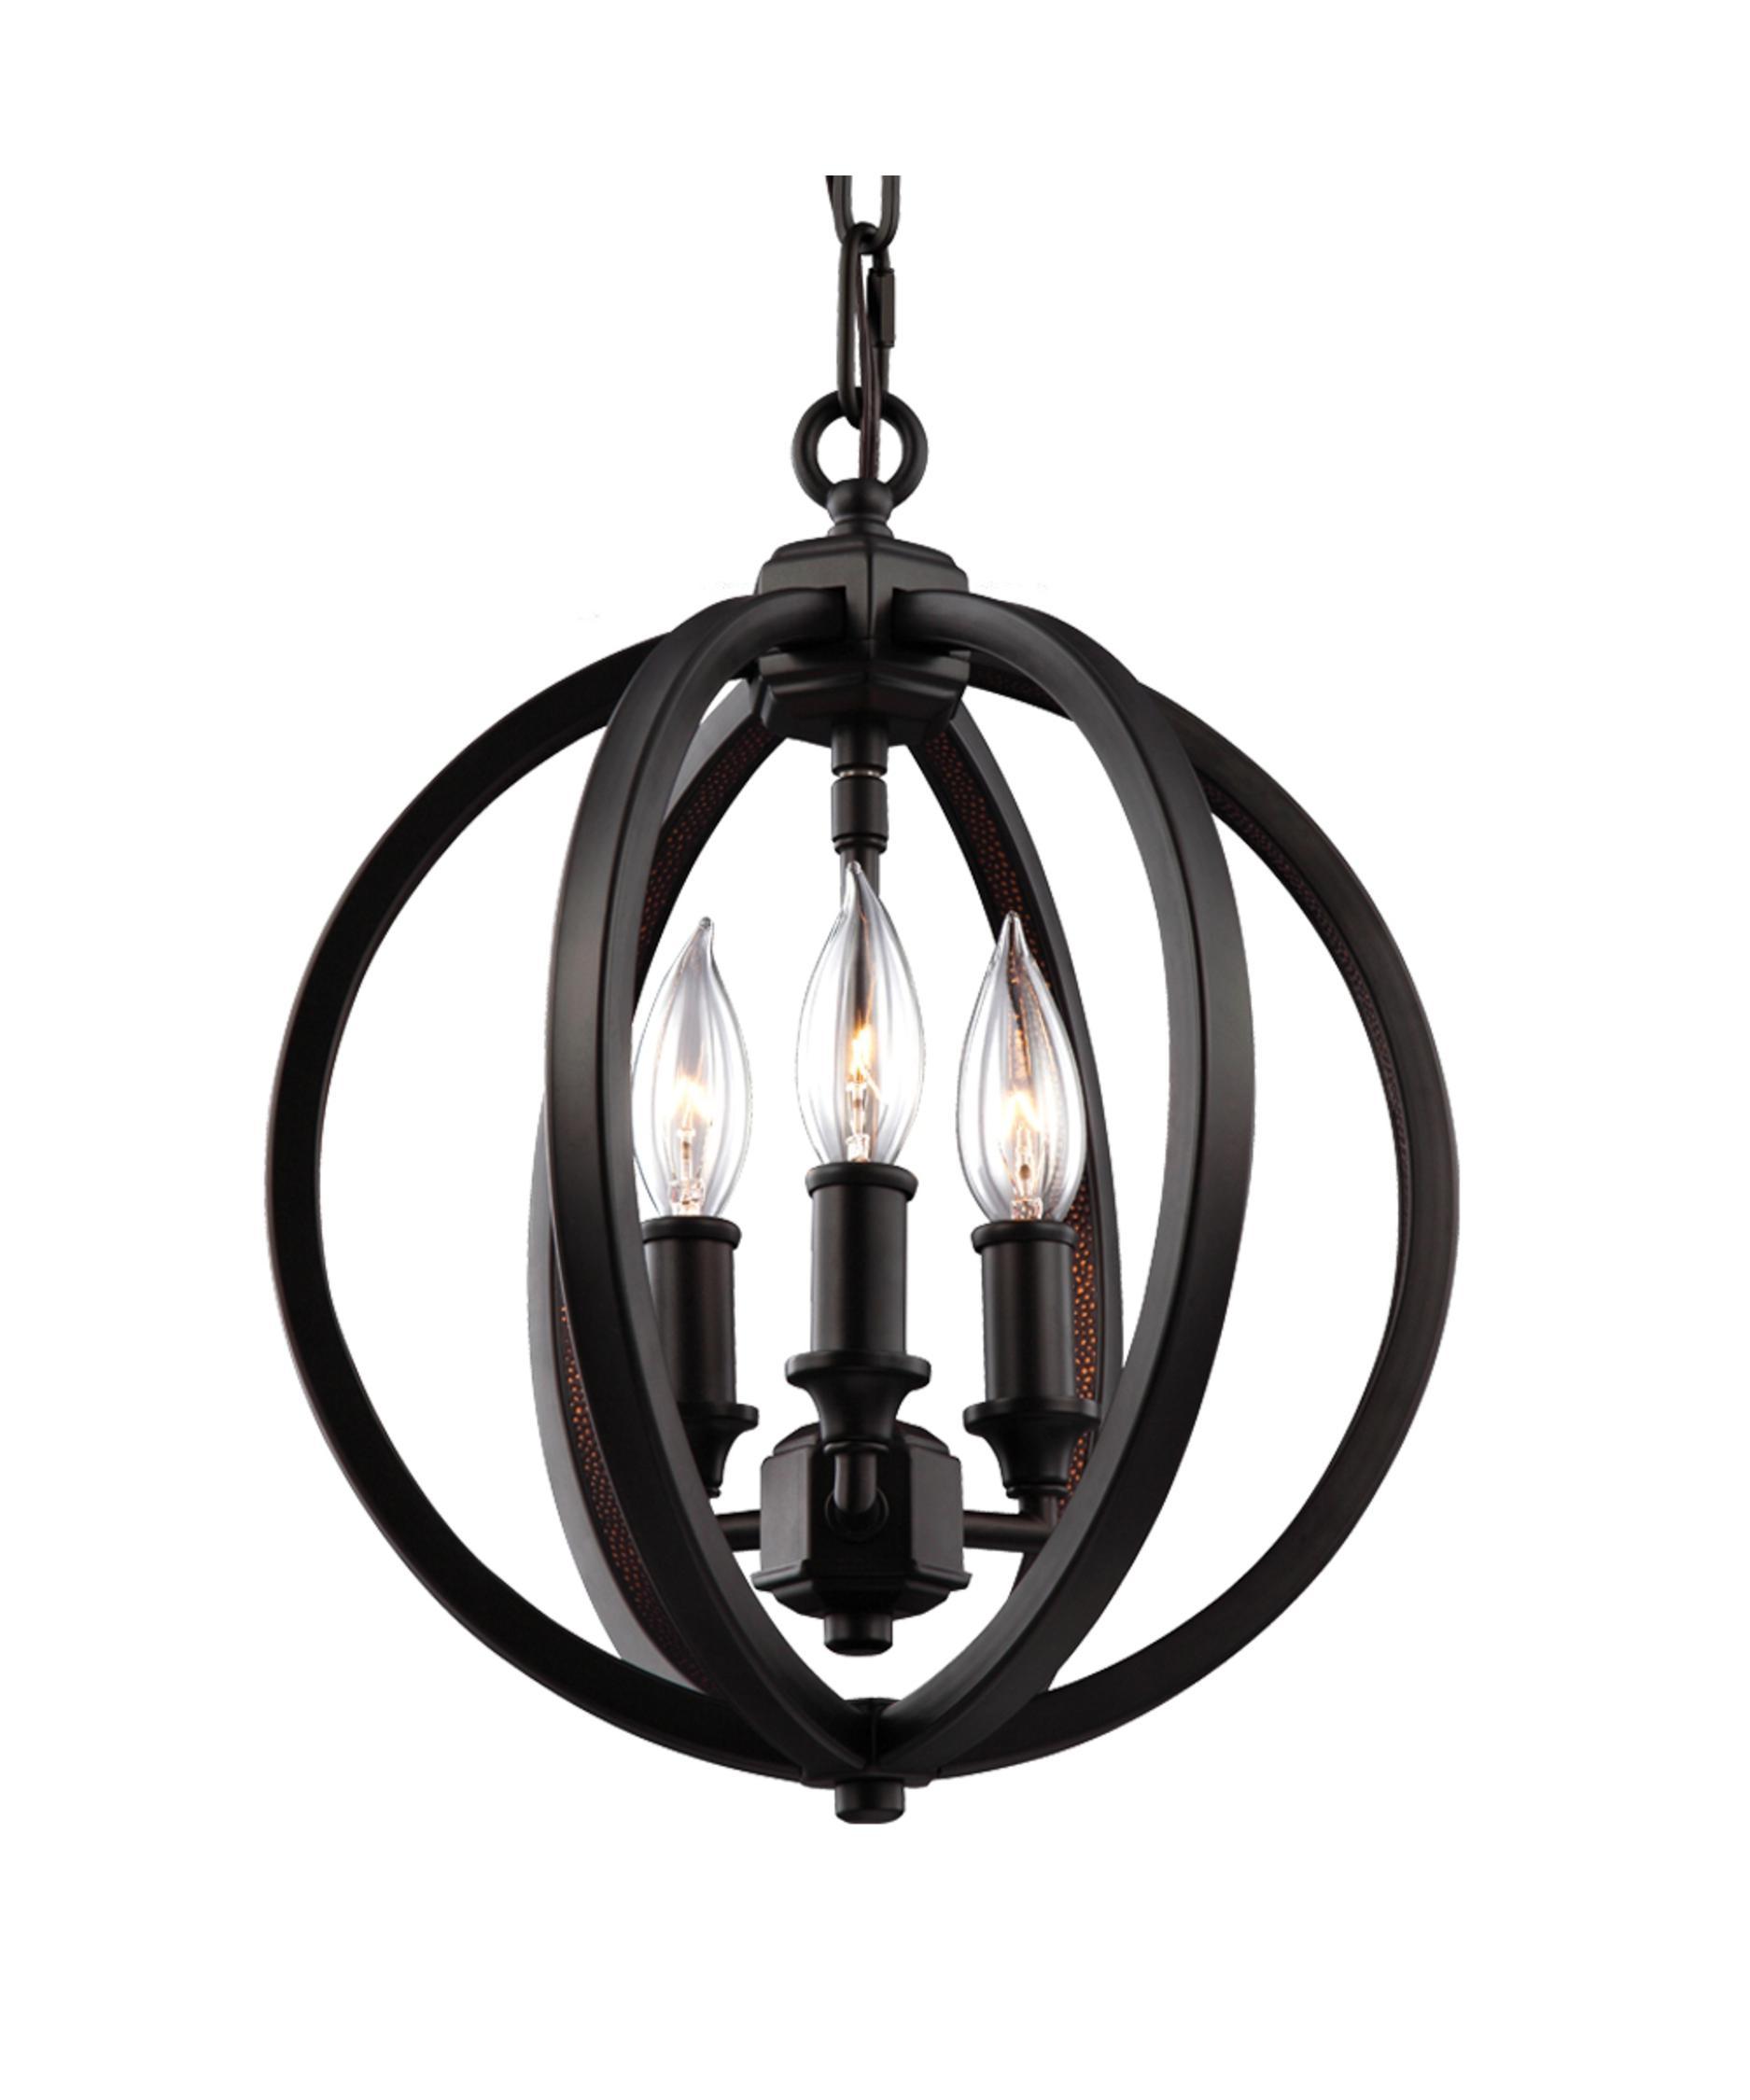 murray feiss f30593 corinne 11 inch wide 3 light mini chandelier capitol lighting